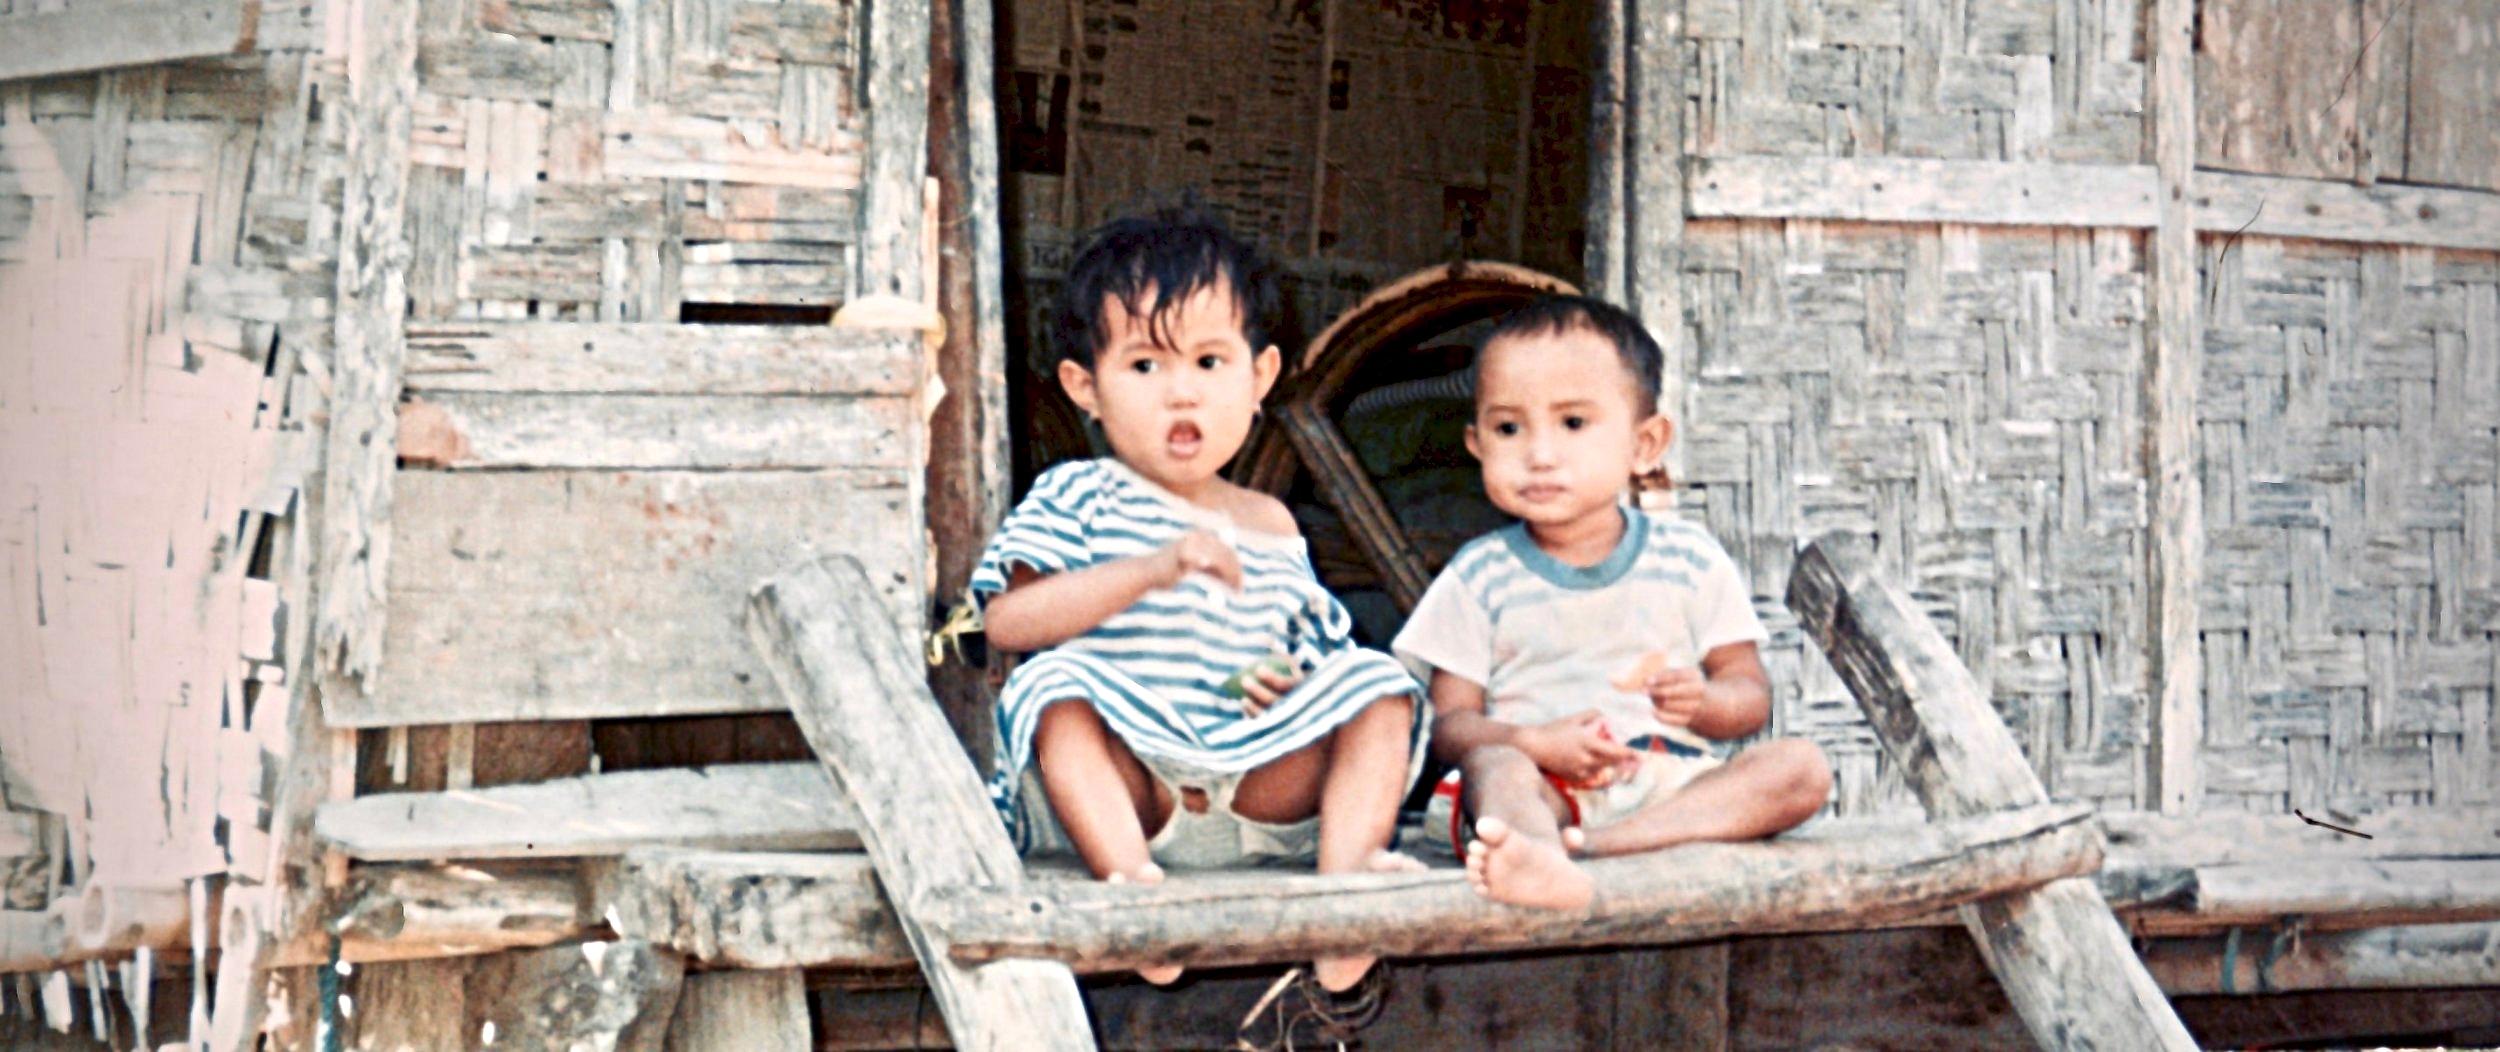 Indonesia Sumbawa kids.jpg